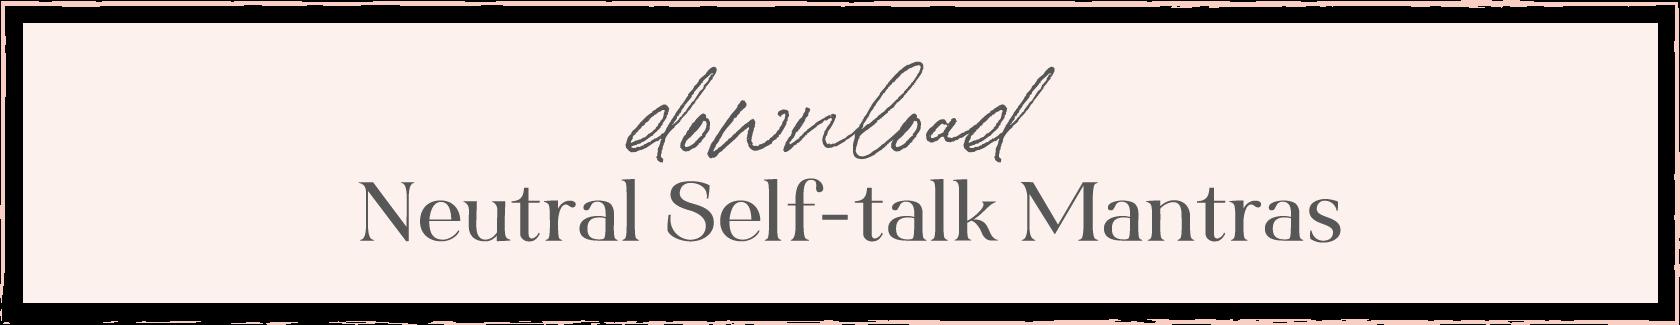 download neutral self talk mantras